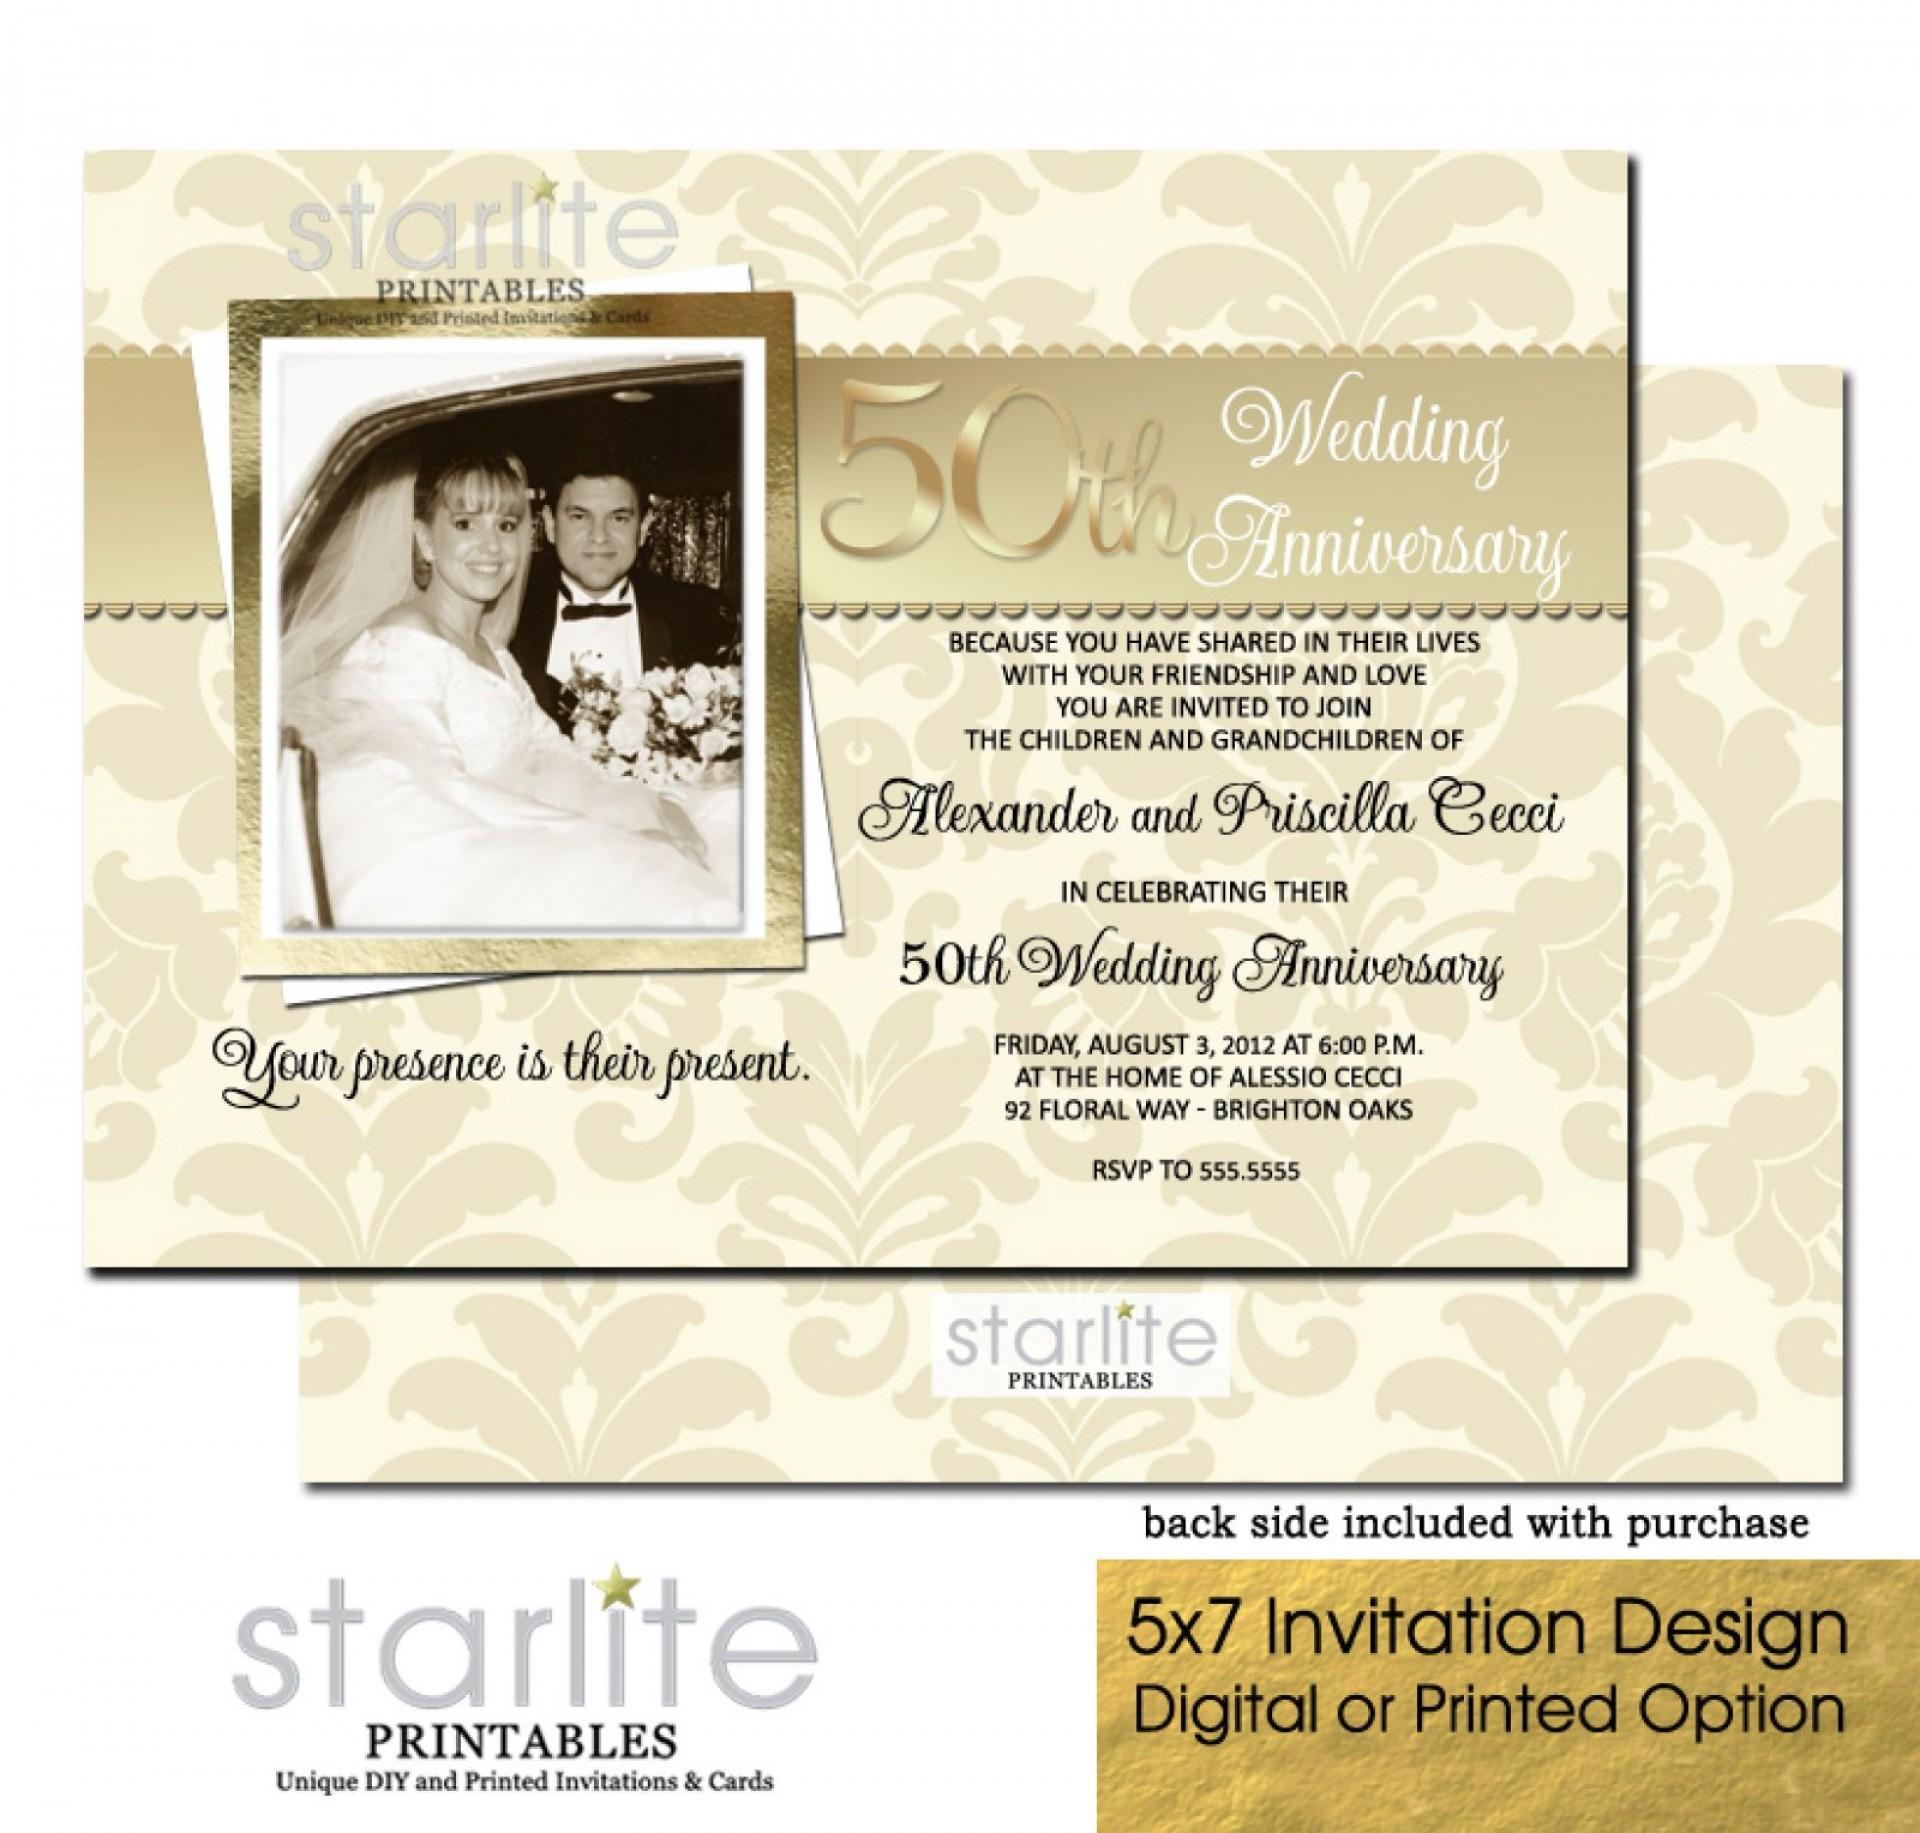 007 Top 50th Anniversary Invitation Design Image  Designs Wedding Template Microsoft Word Surprise Party Wording Card Idea1920